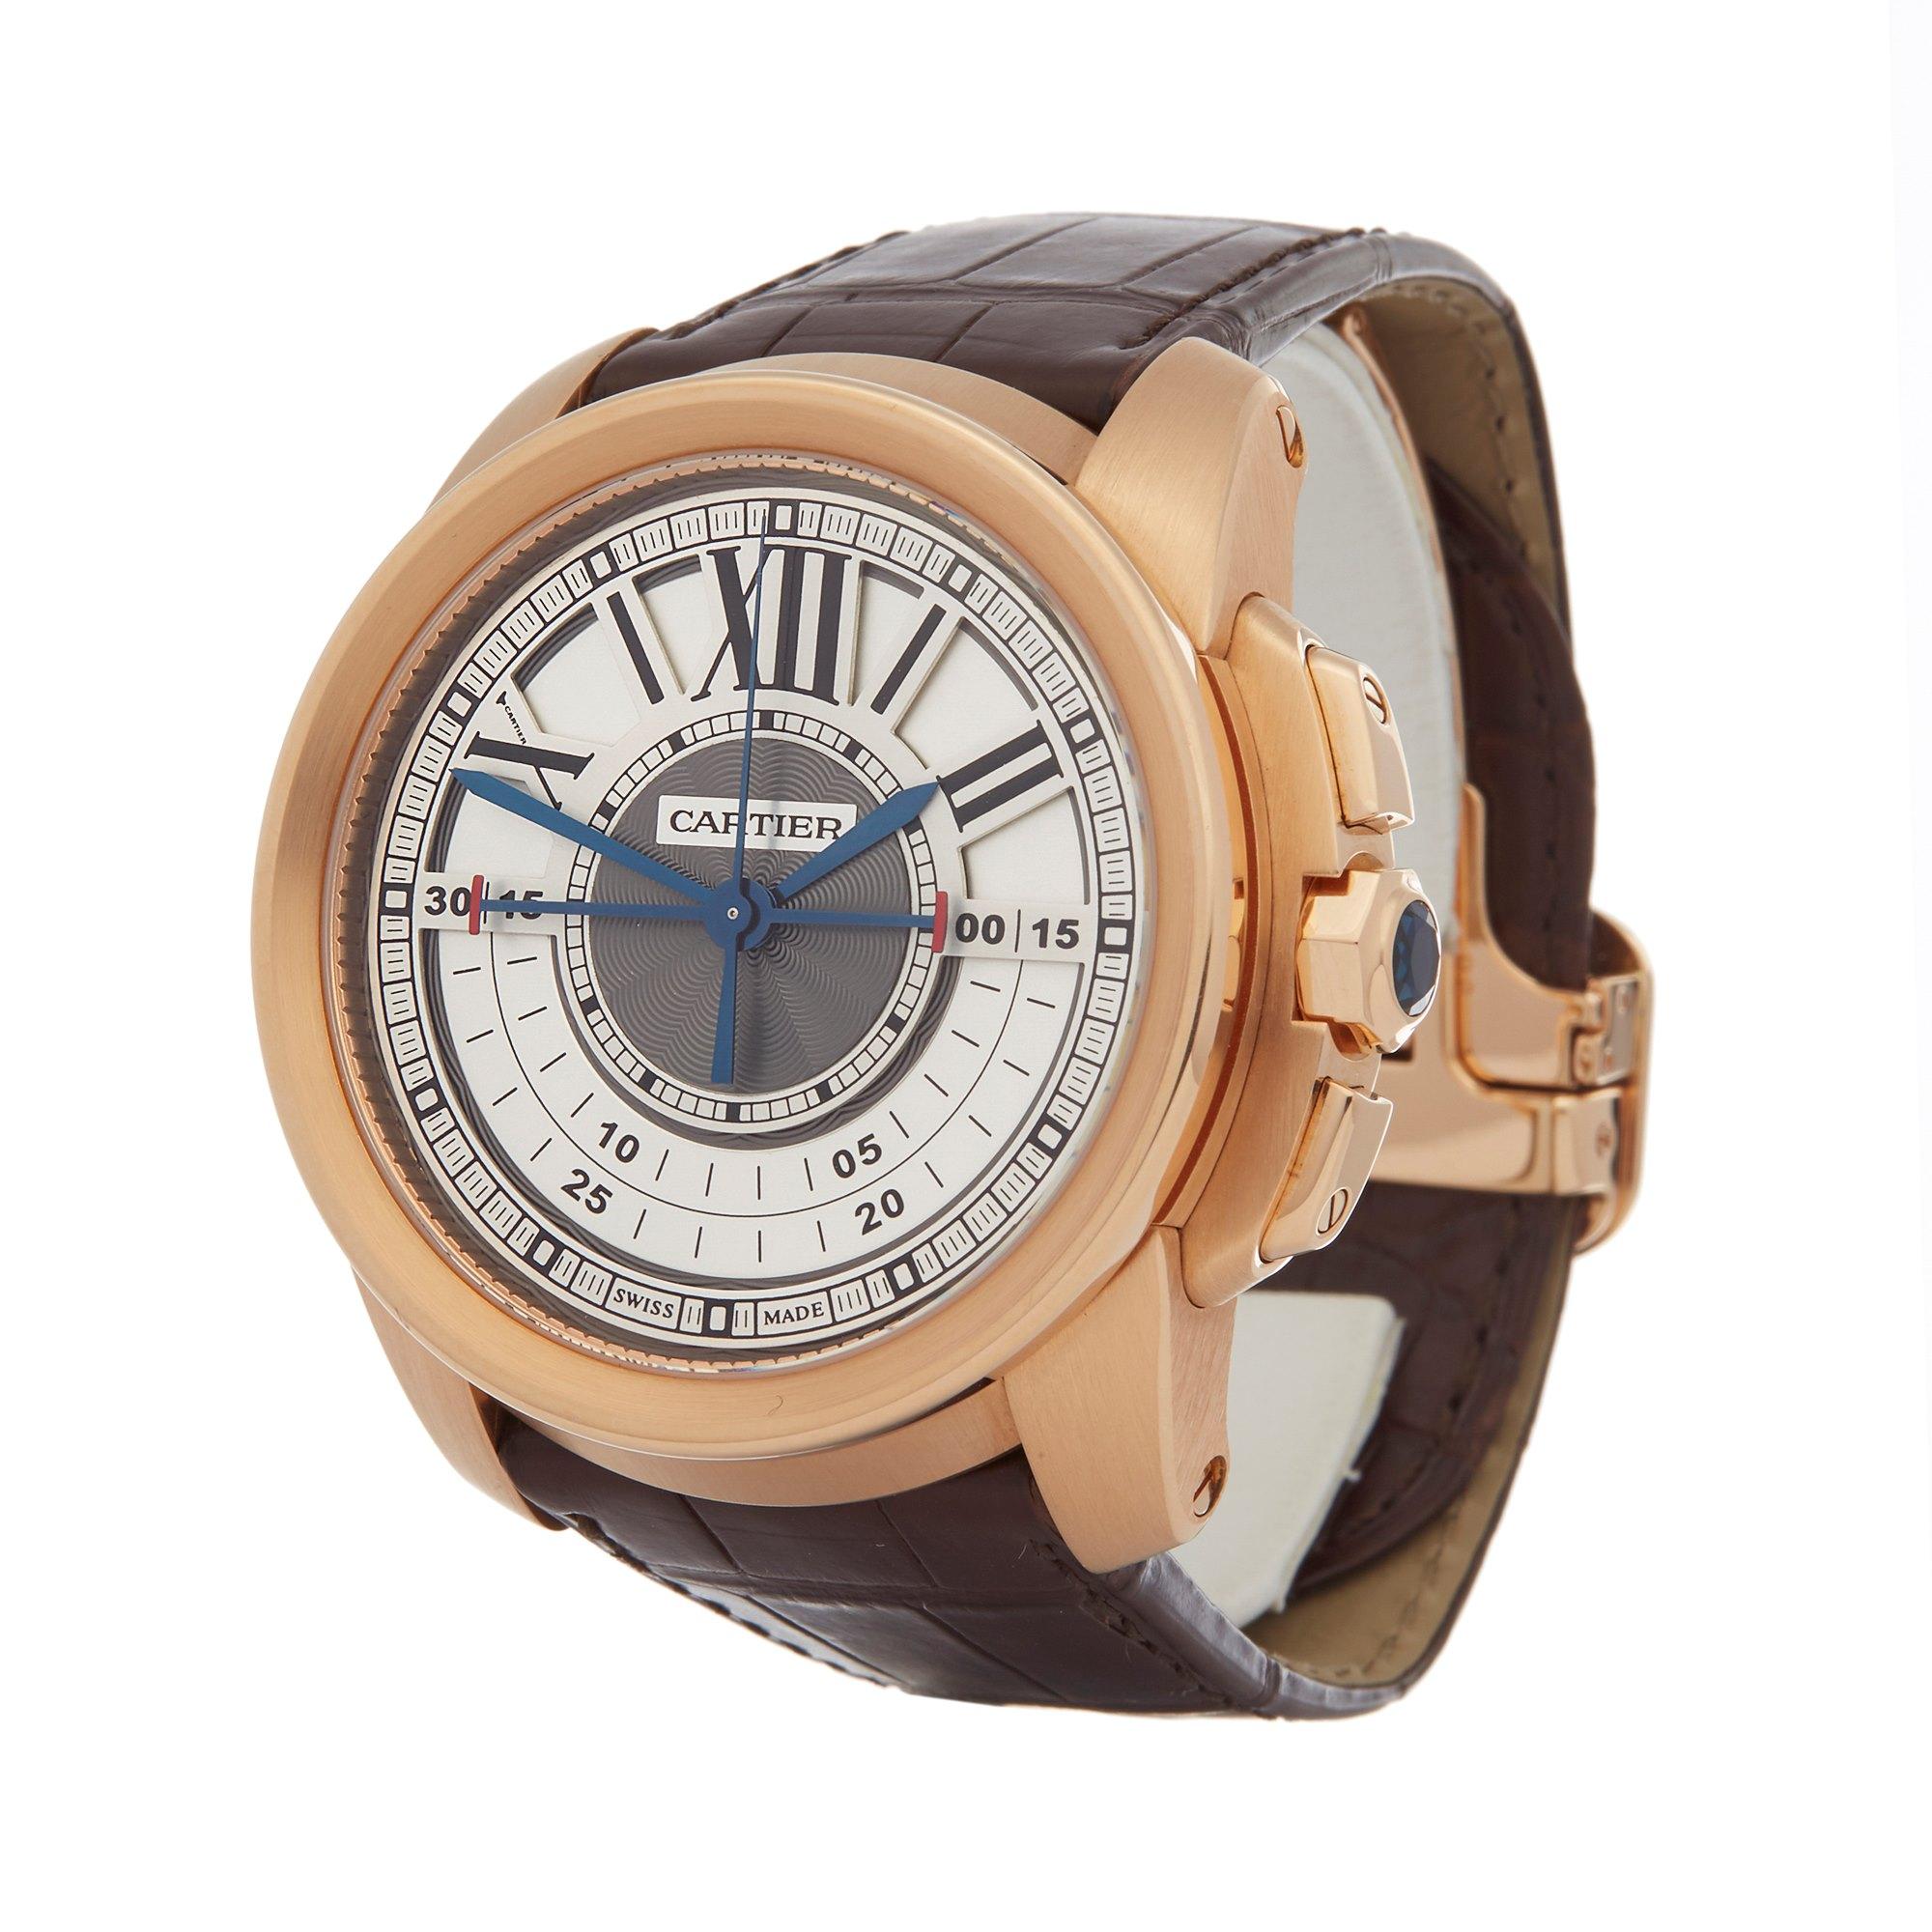 Cartier Calibre Central Chronograph Rose Gold W7100004 or 3242